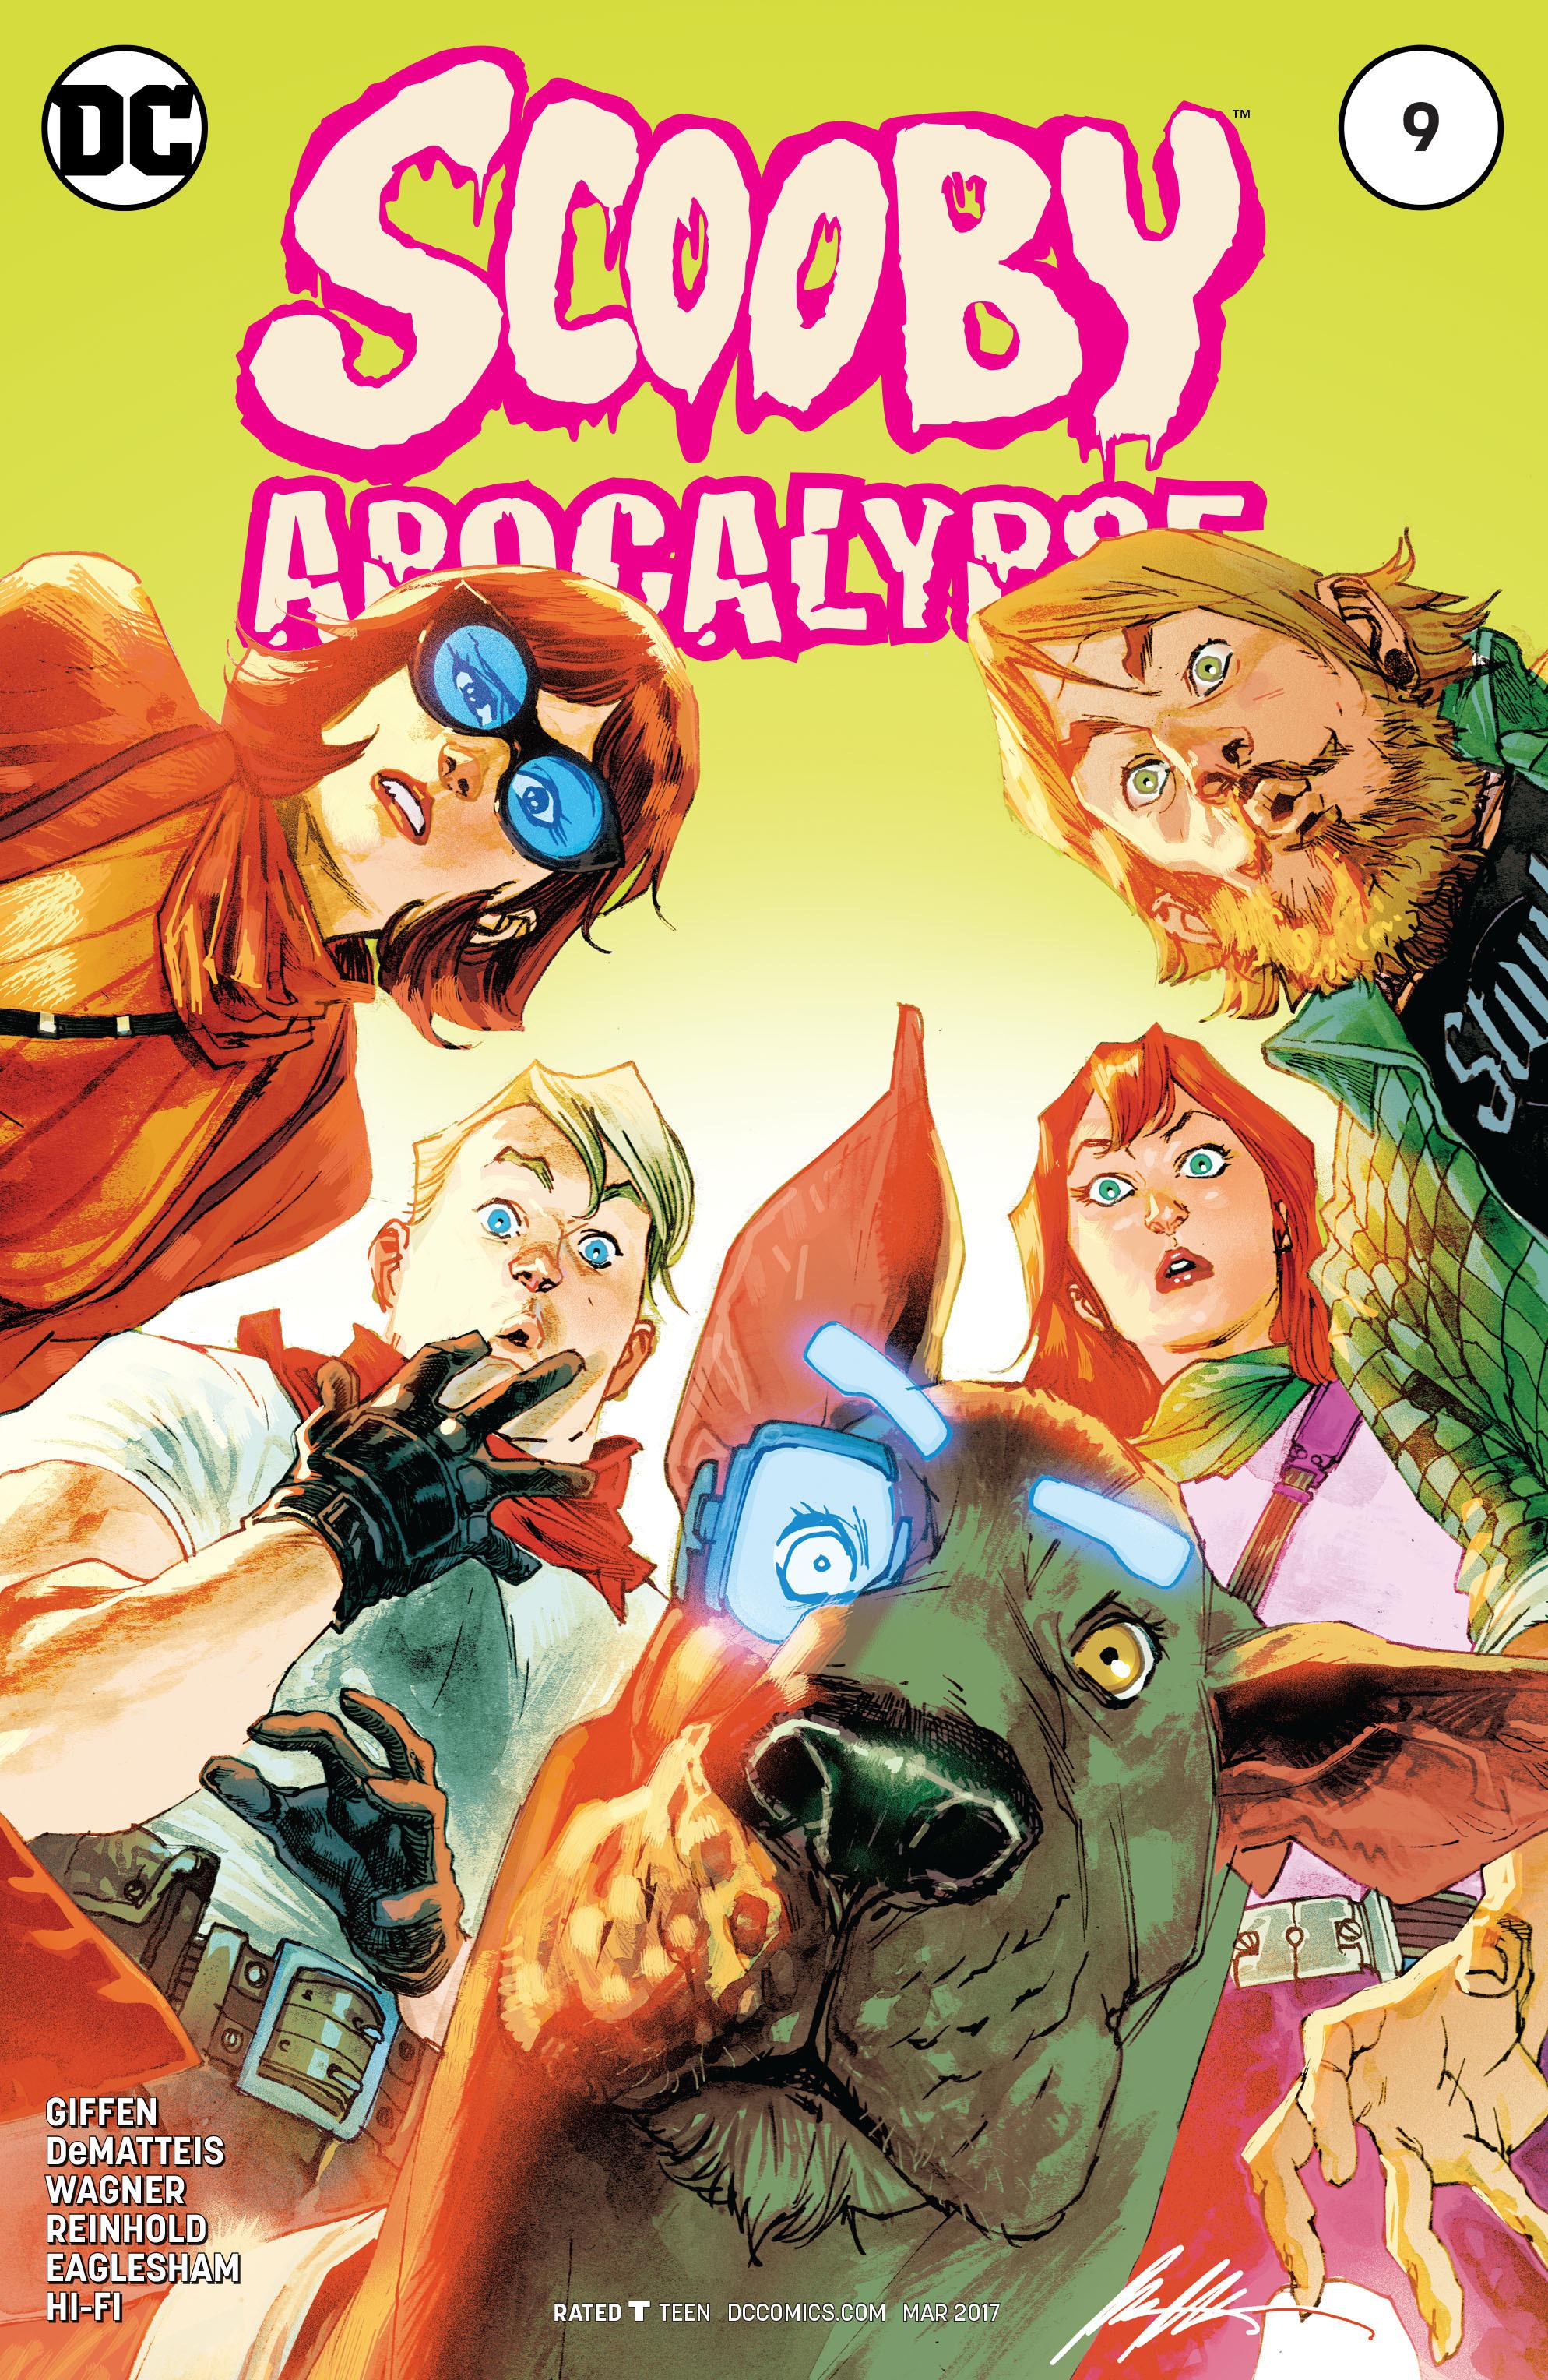 Read online Scooby Apocalypse comic -  Issue #9 - 3